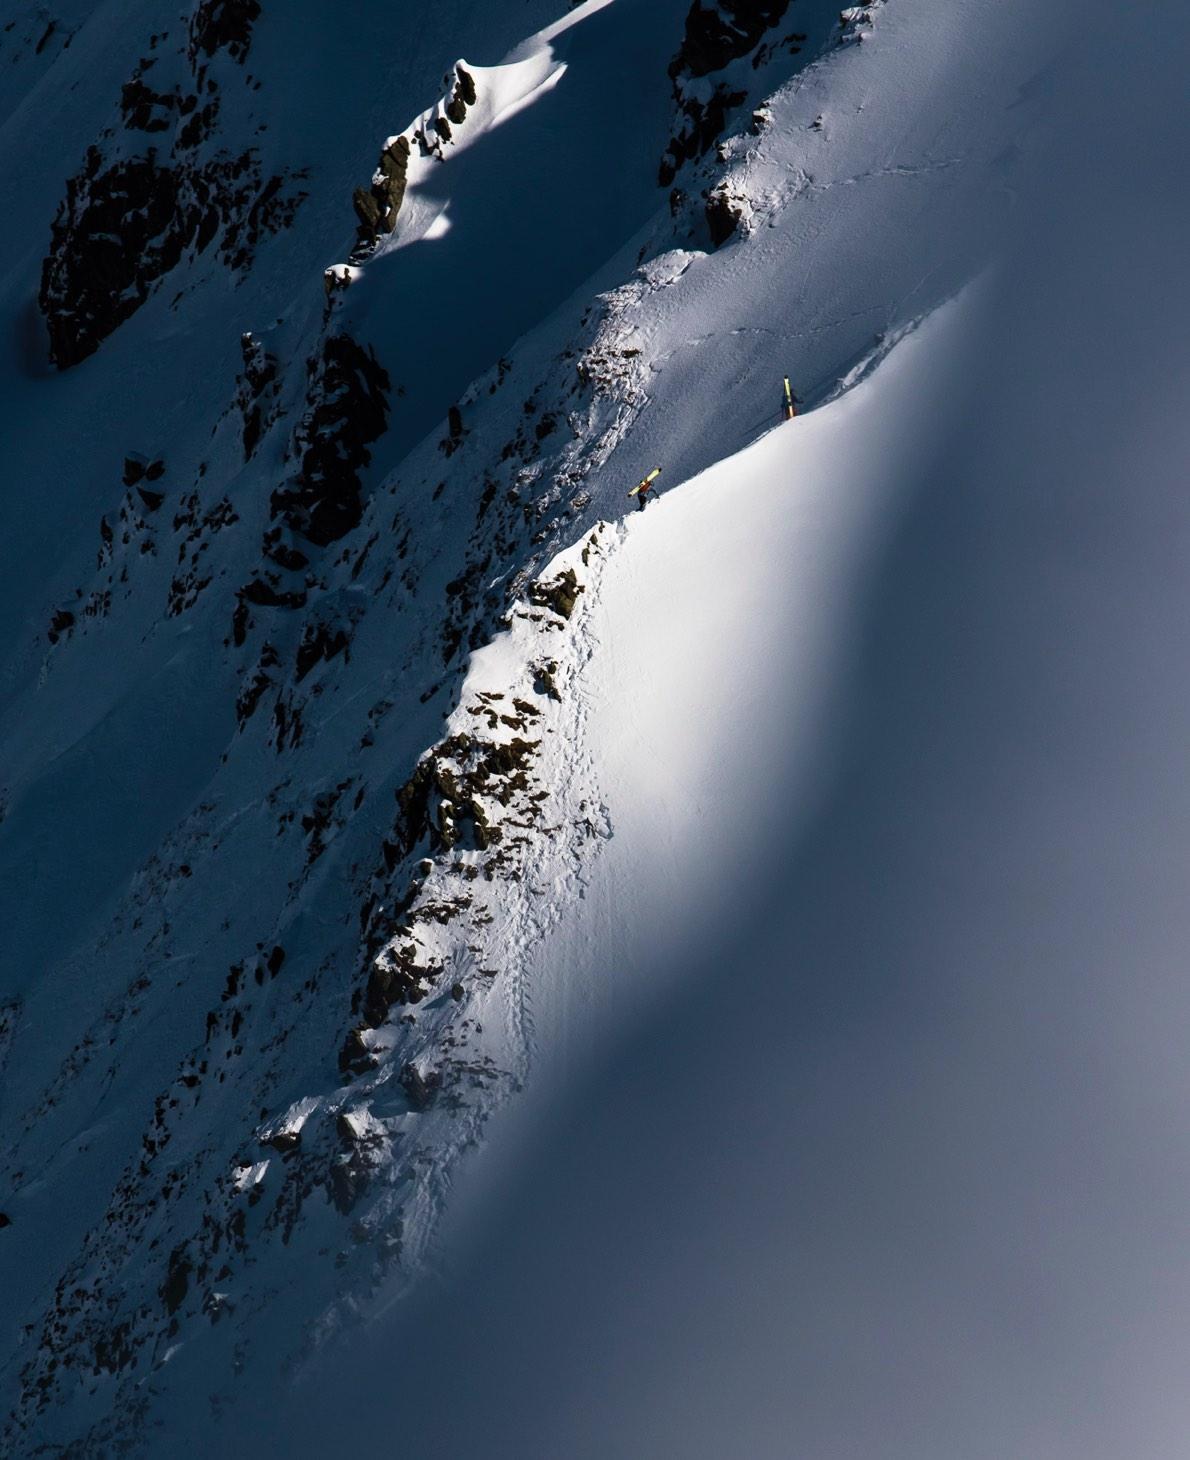 two skiers climbing on a ridge